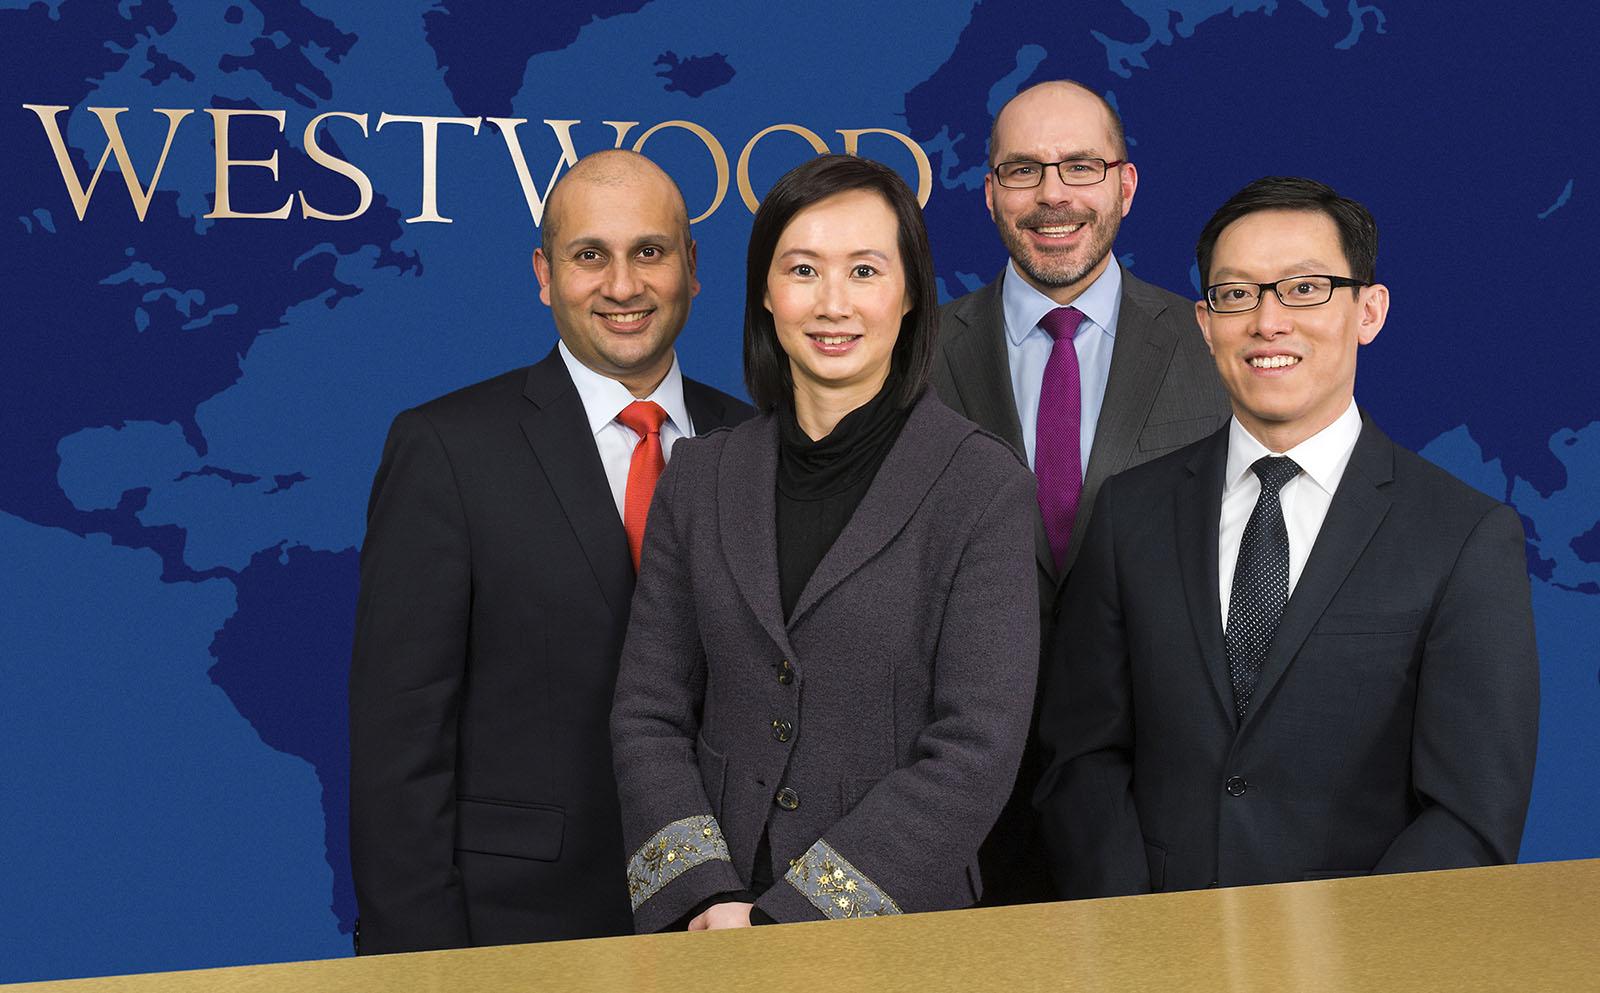 A group portrait of four executives.